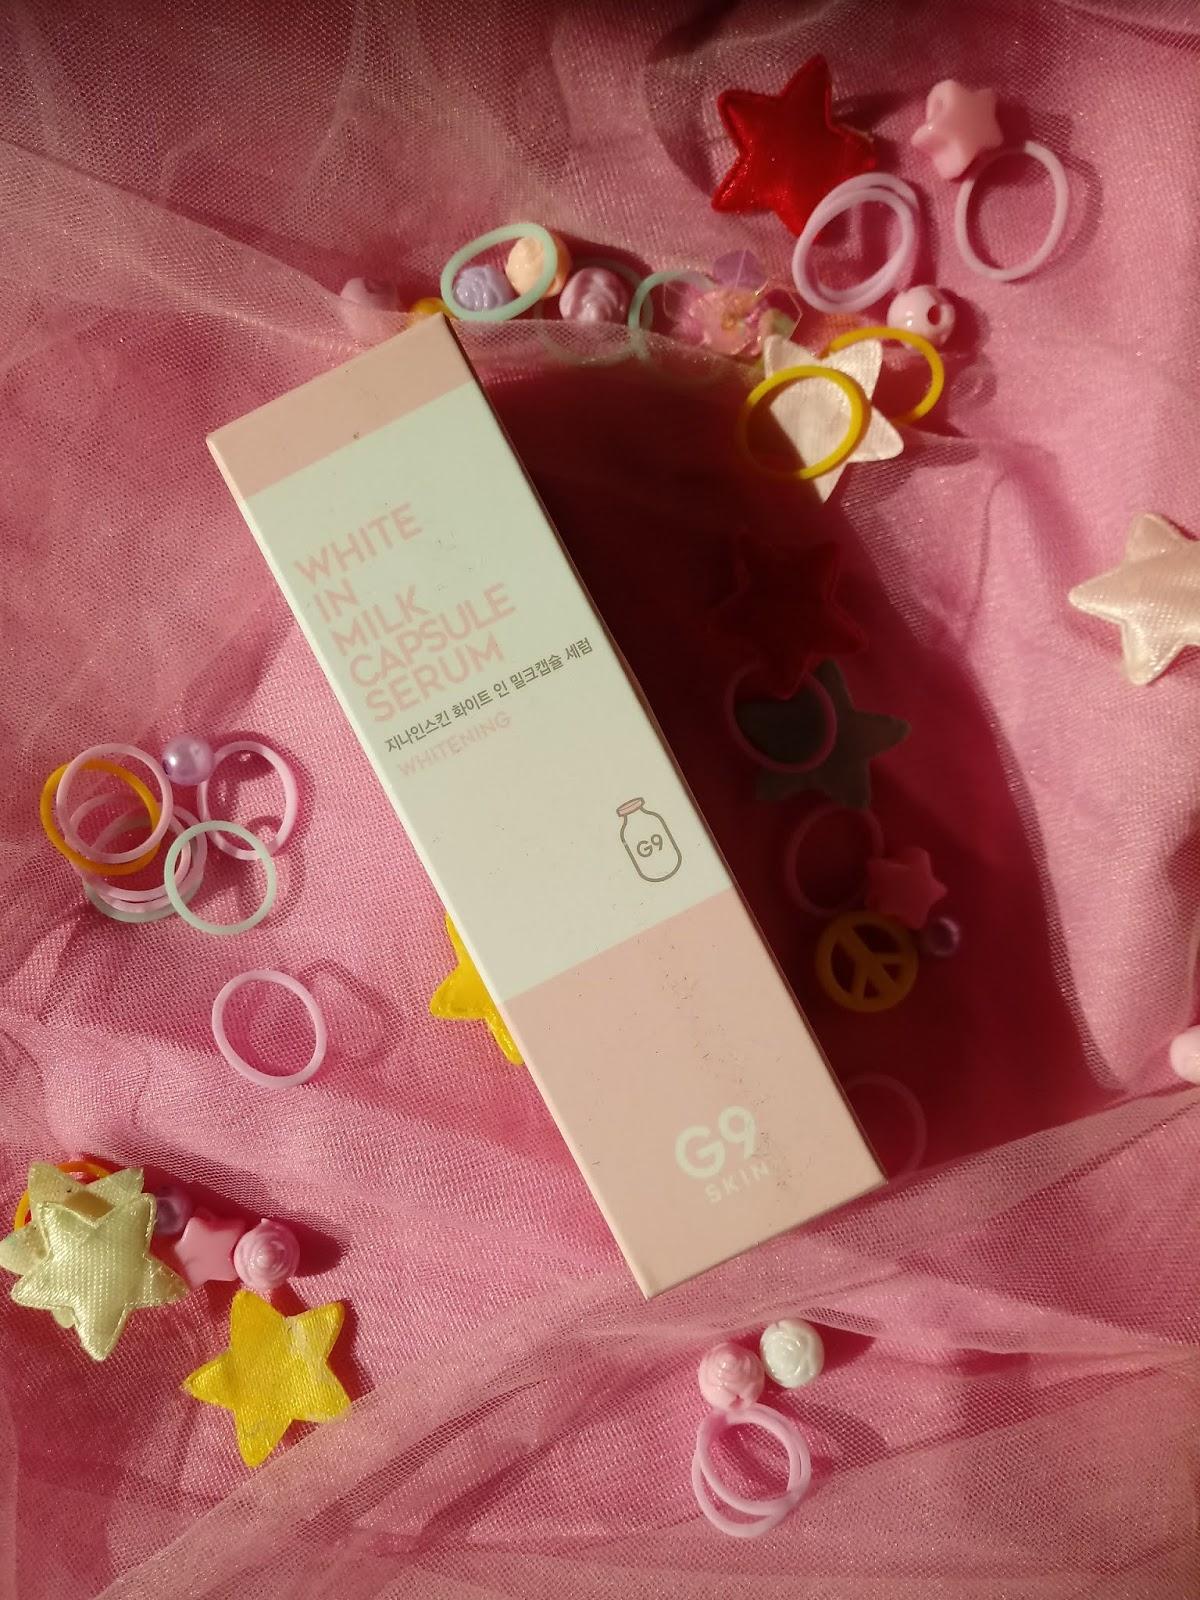 g9skin white in milk capsule serum review